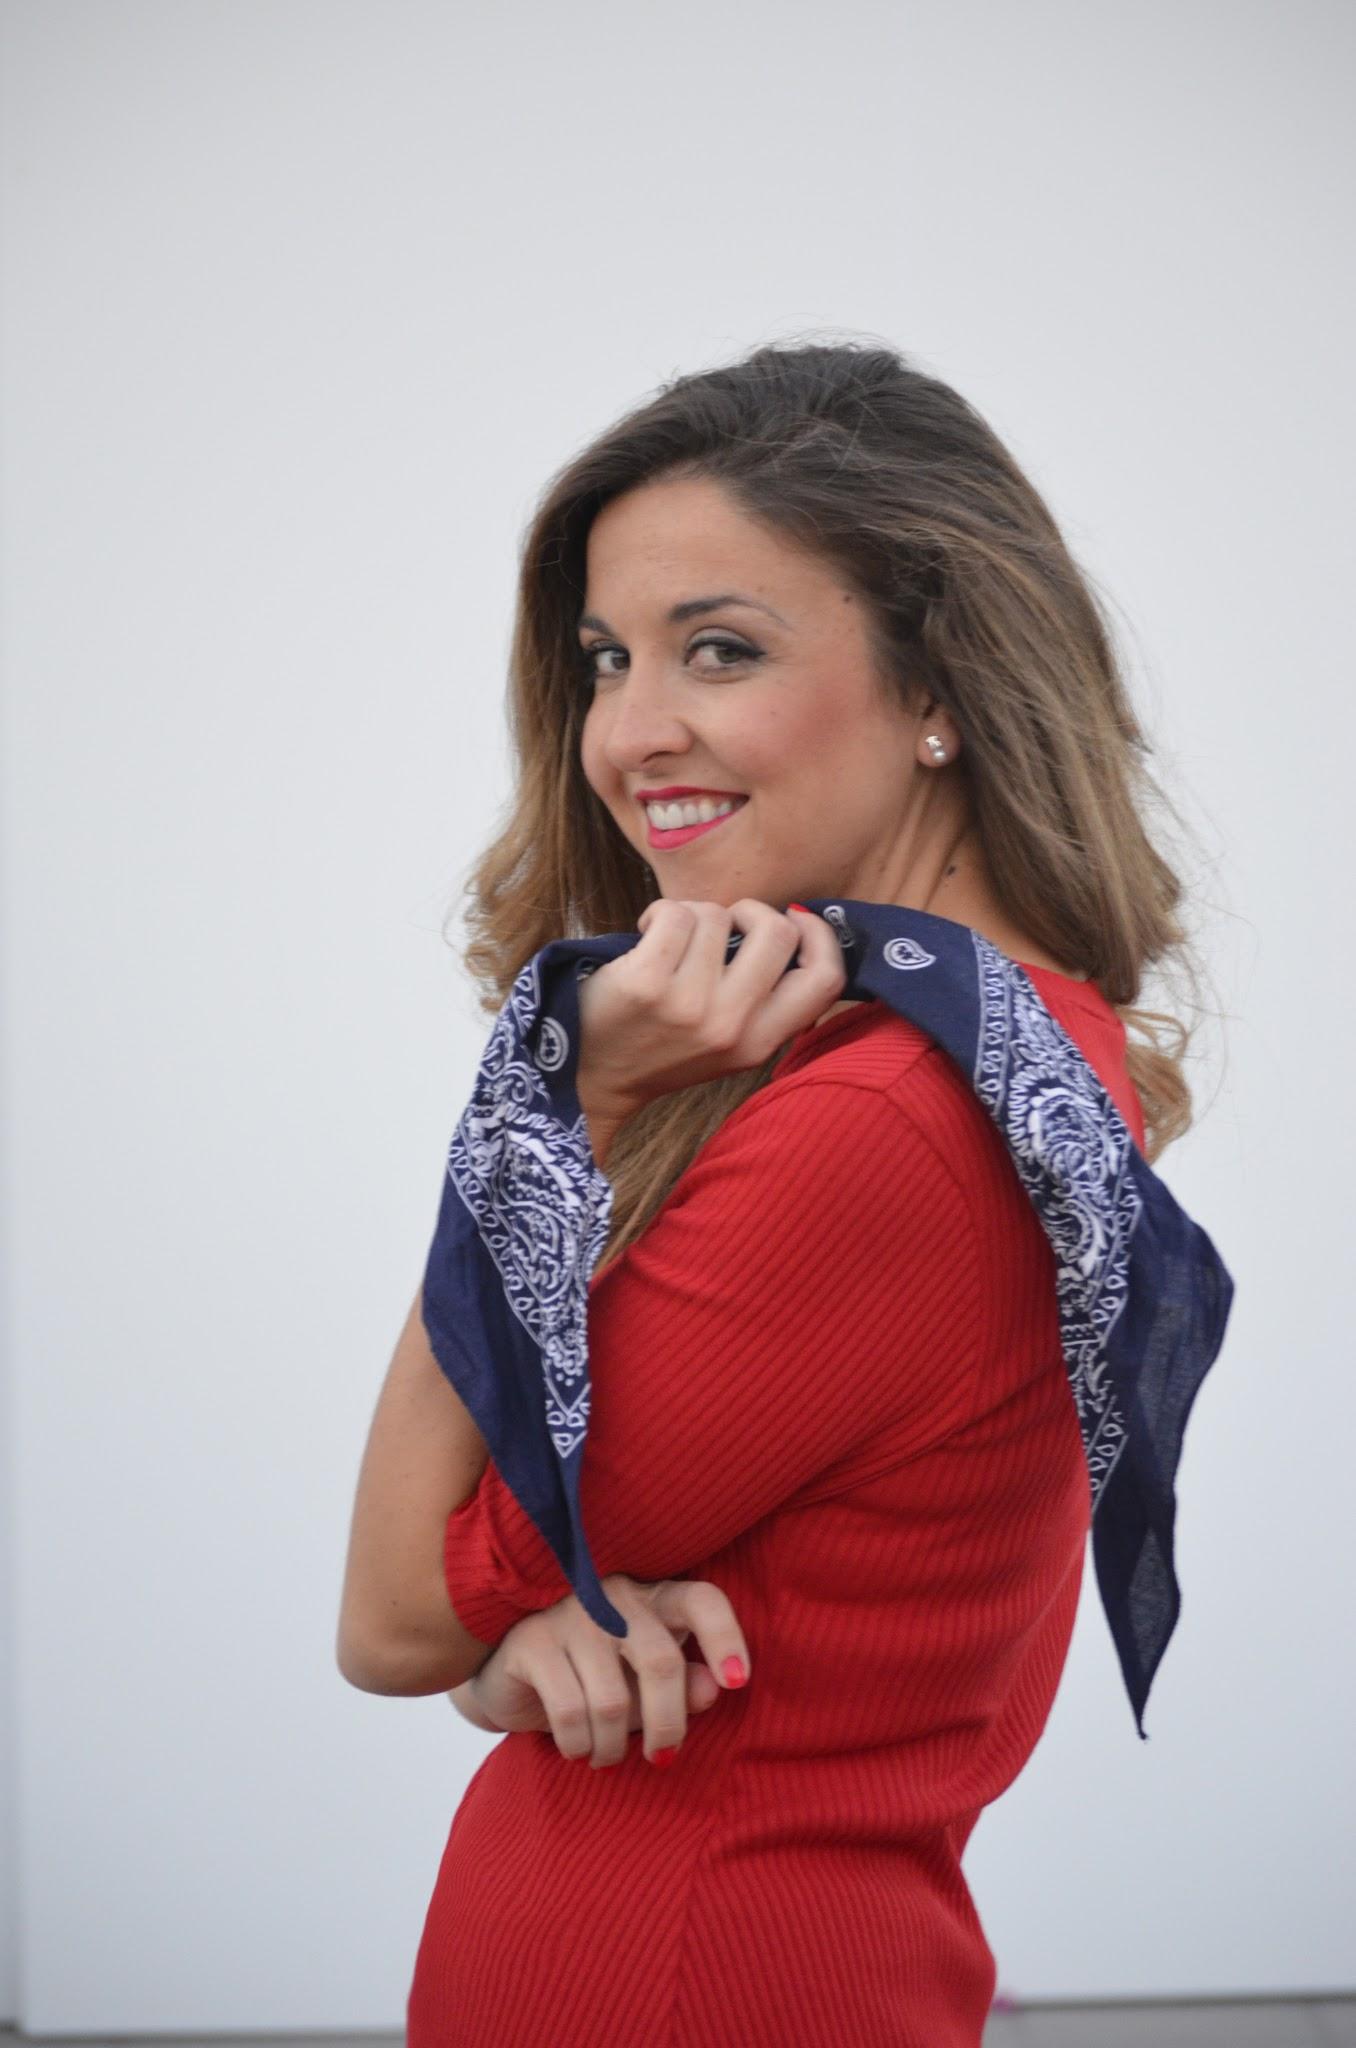 complemento de moda pañuelo al cuello